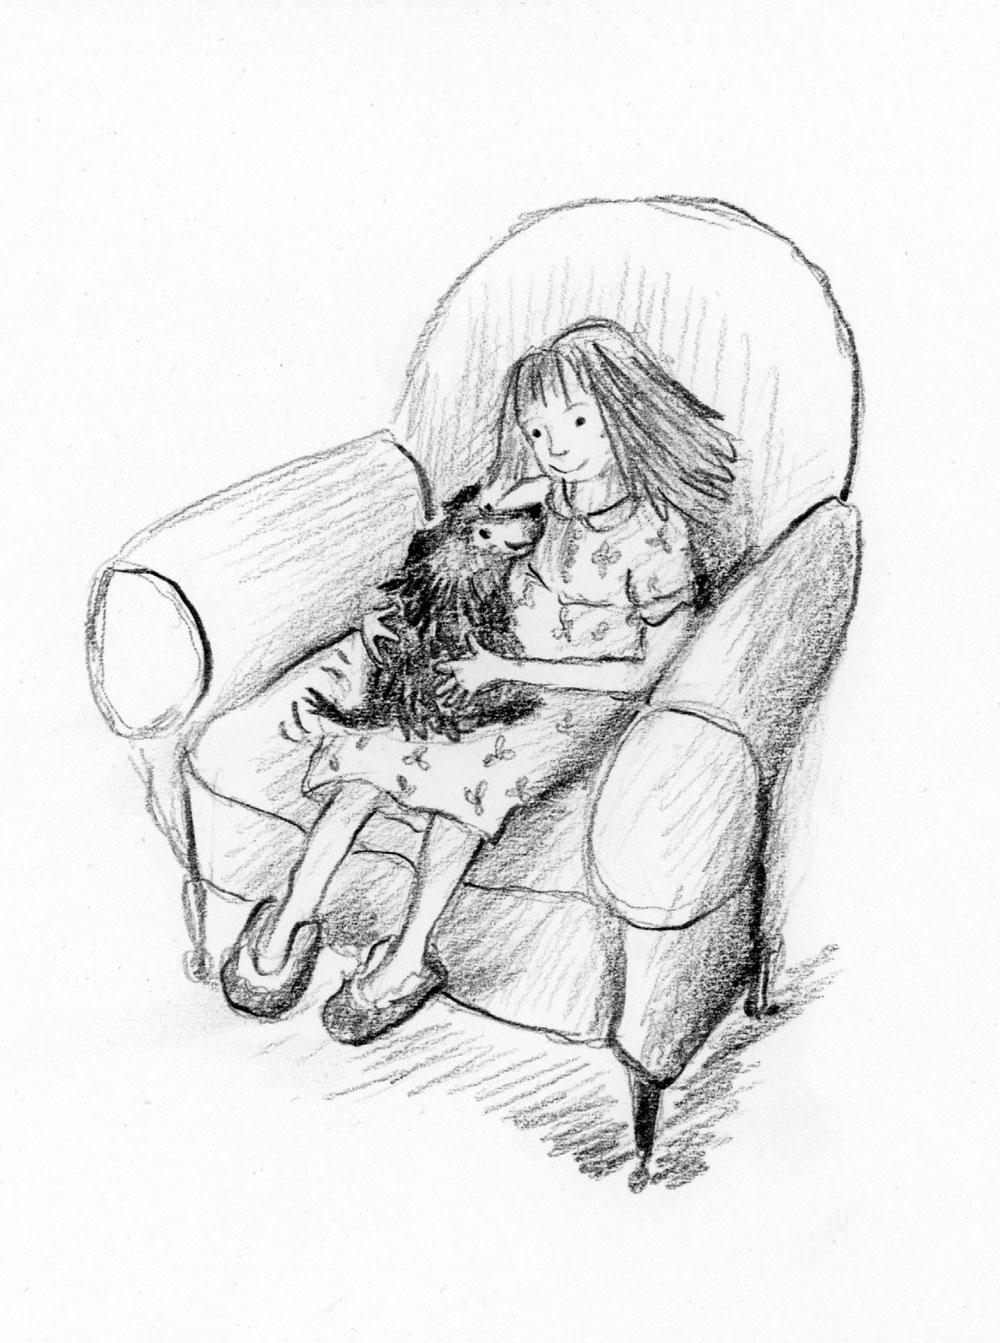 Illustration from Bigfoot Story